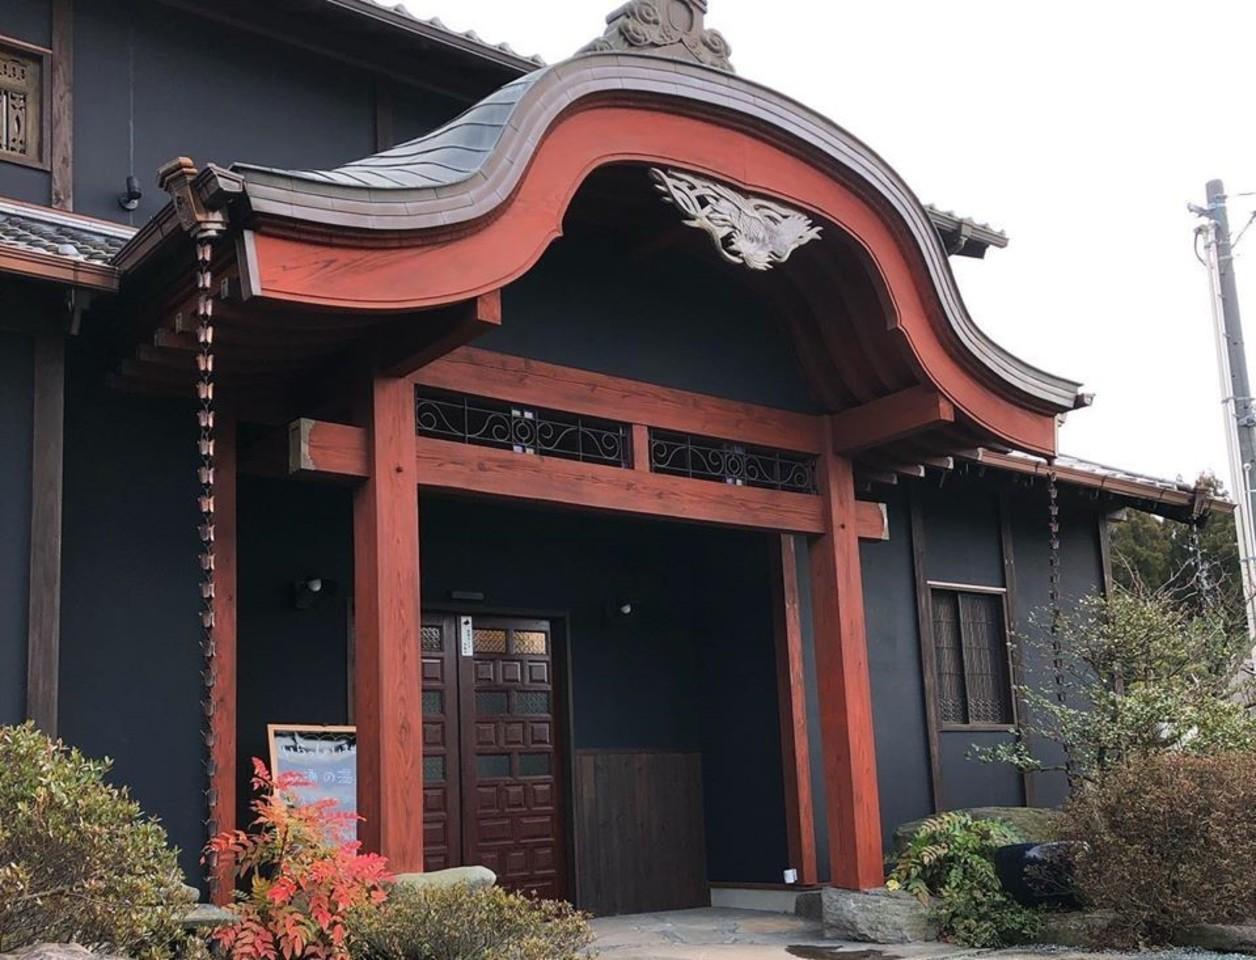 熊本県菊池市の日帰り温泉『地涌の温泉』